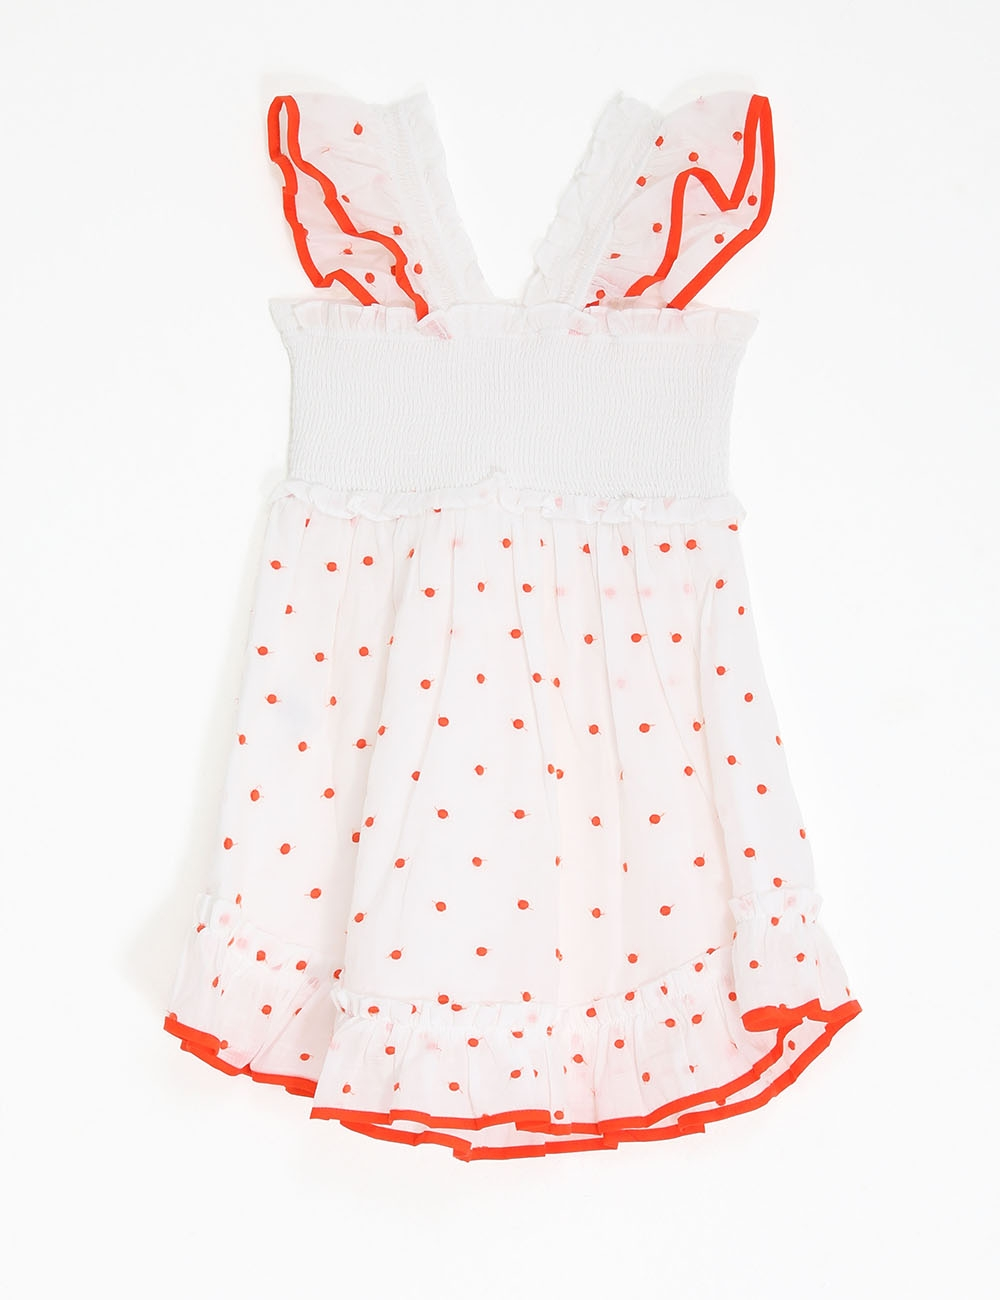 Estelle Shirred Ruffle Dress